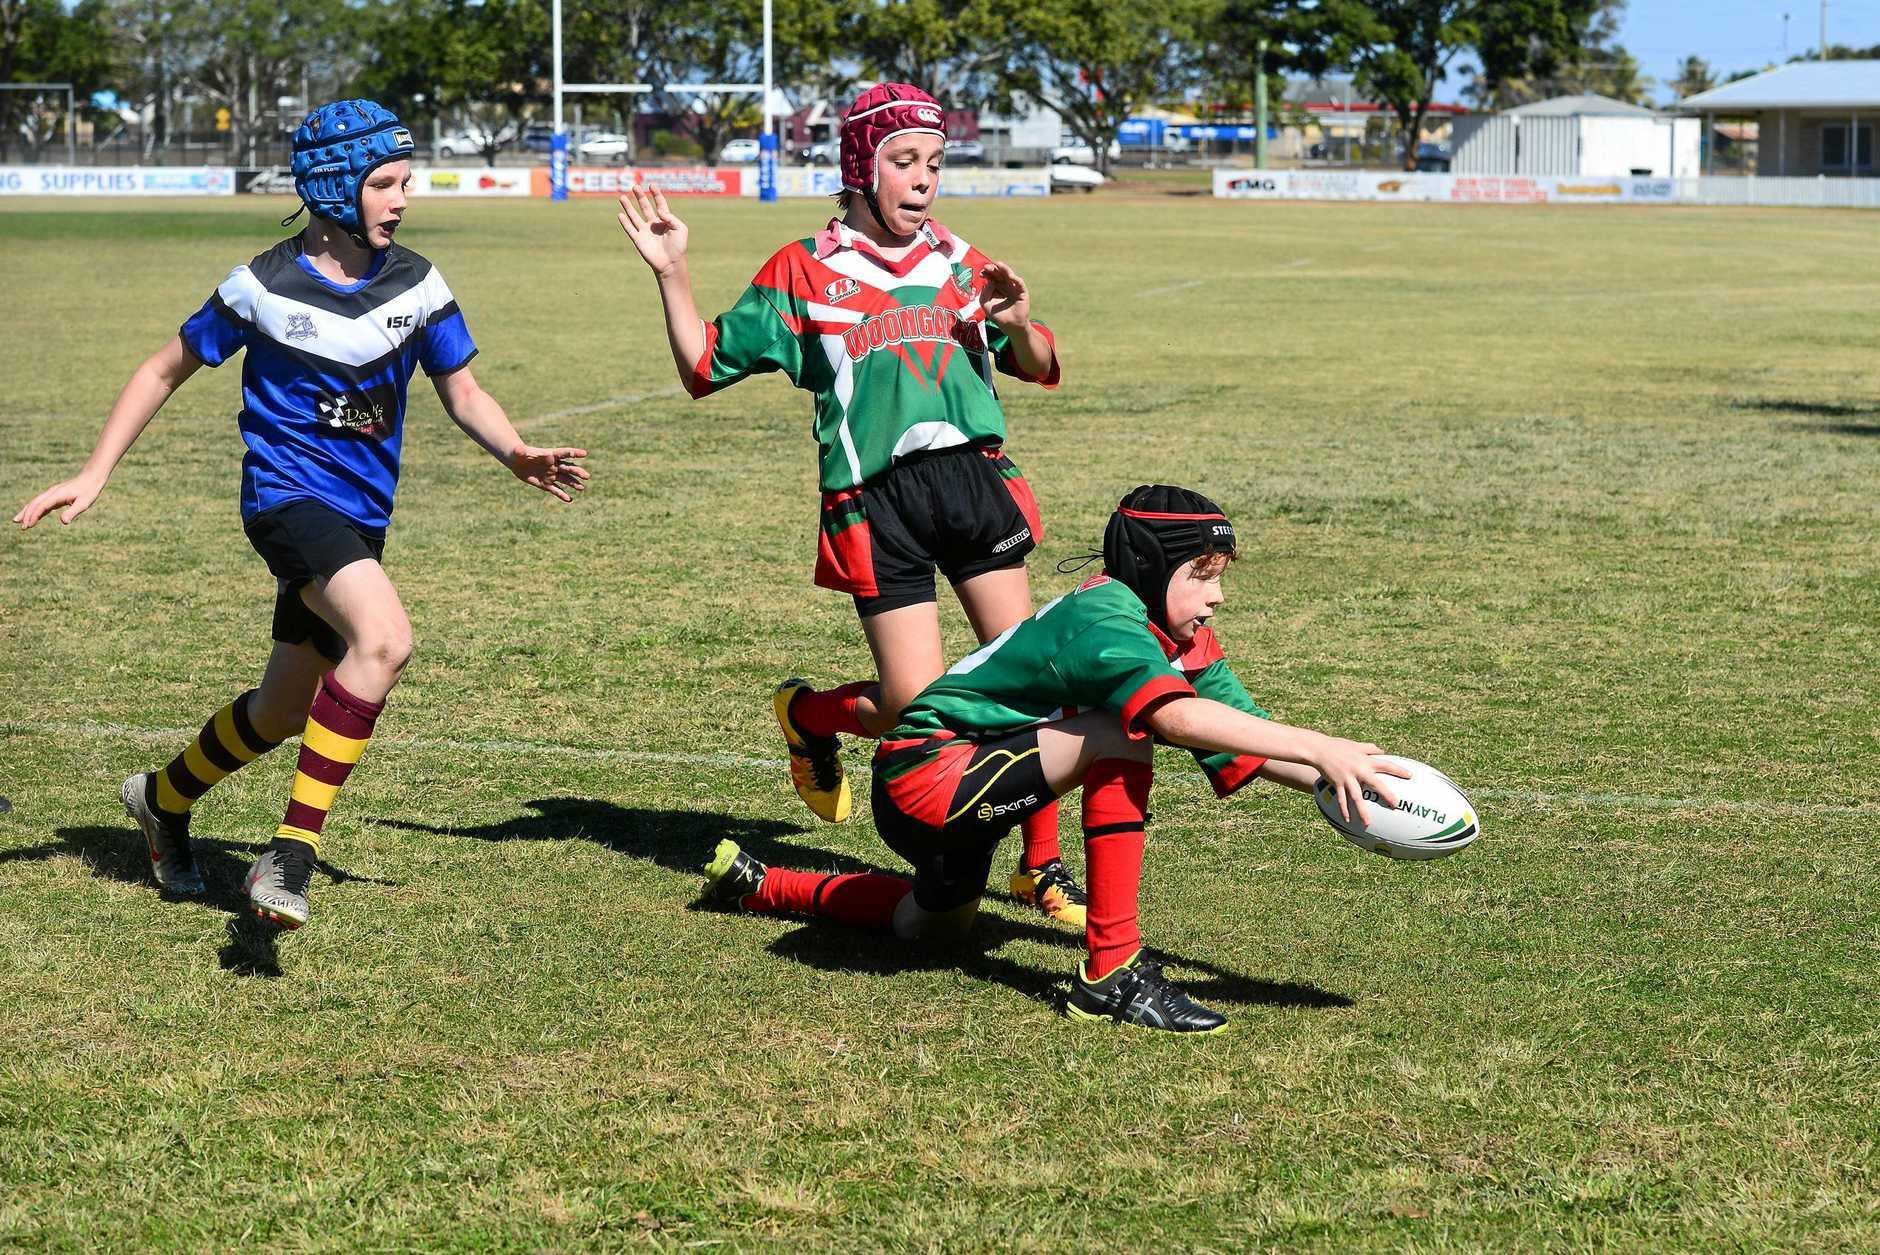 MATCH WINNER: Woongarra State School's Hudson Strickfuss scores the try that won the match.